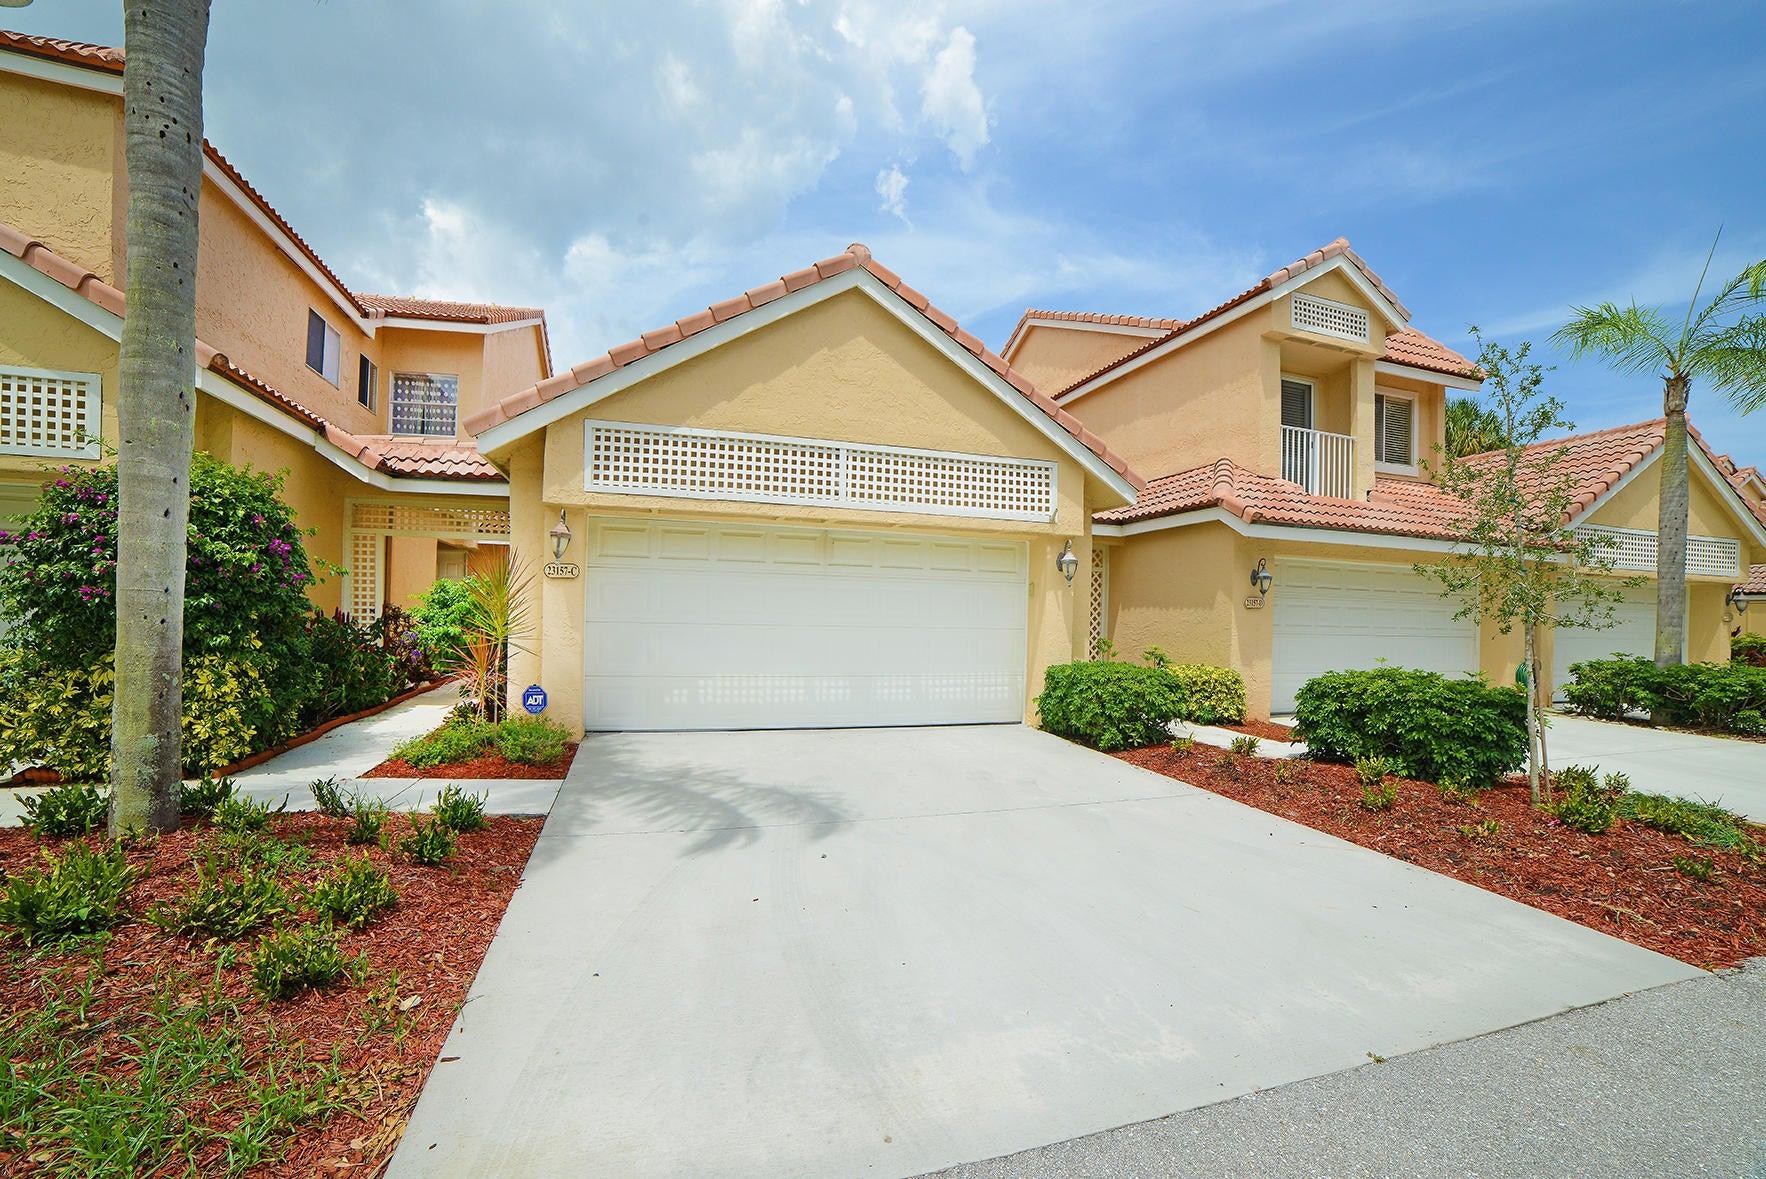 23157 Fountain View, C, Boca Raton, FL 33433